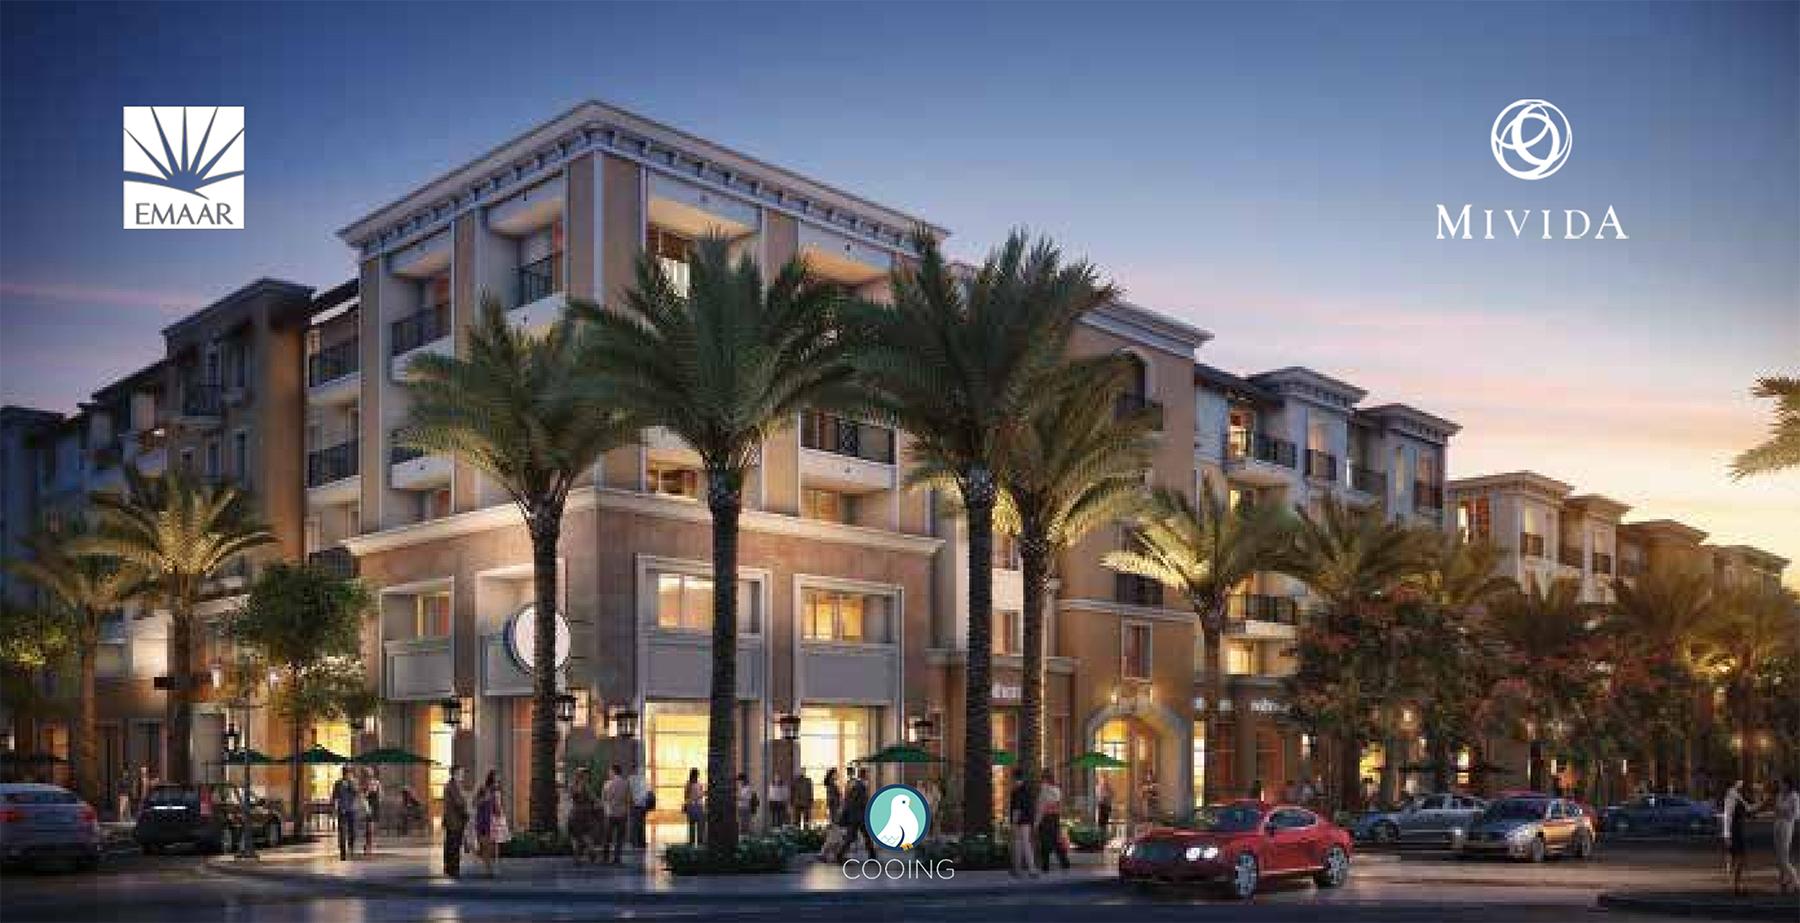 Apartment for Sale – Ground in Garden – in Mivida Emaar Compound